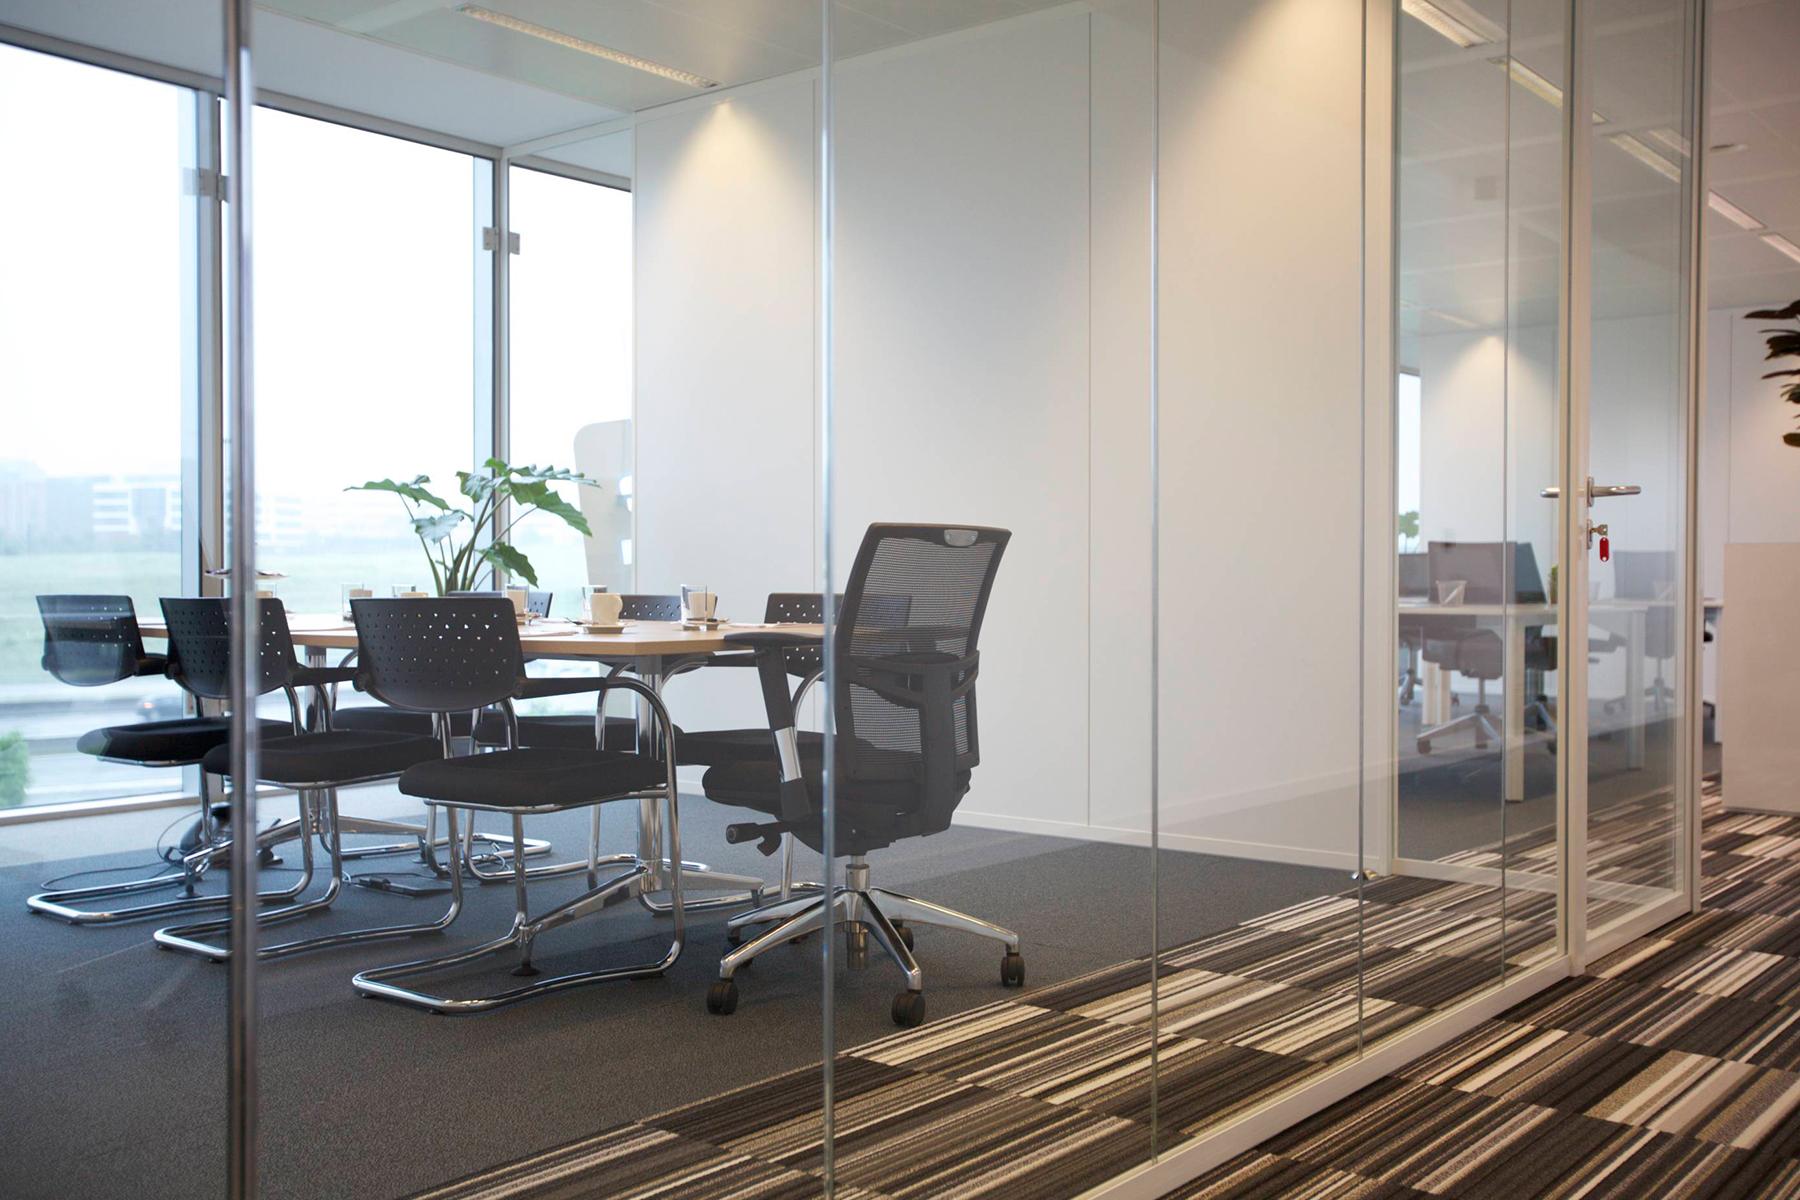 kantoorruimte brussel airport meubilair kantoorunit stoel bureau